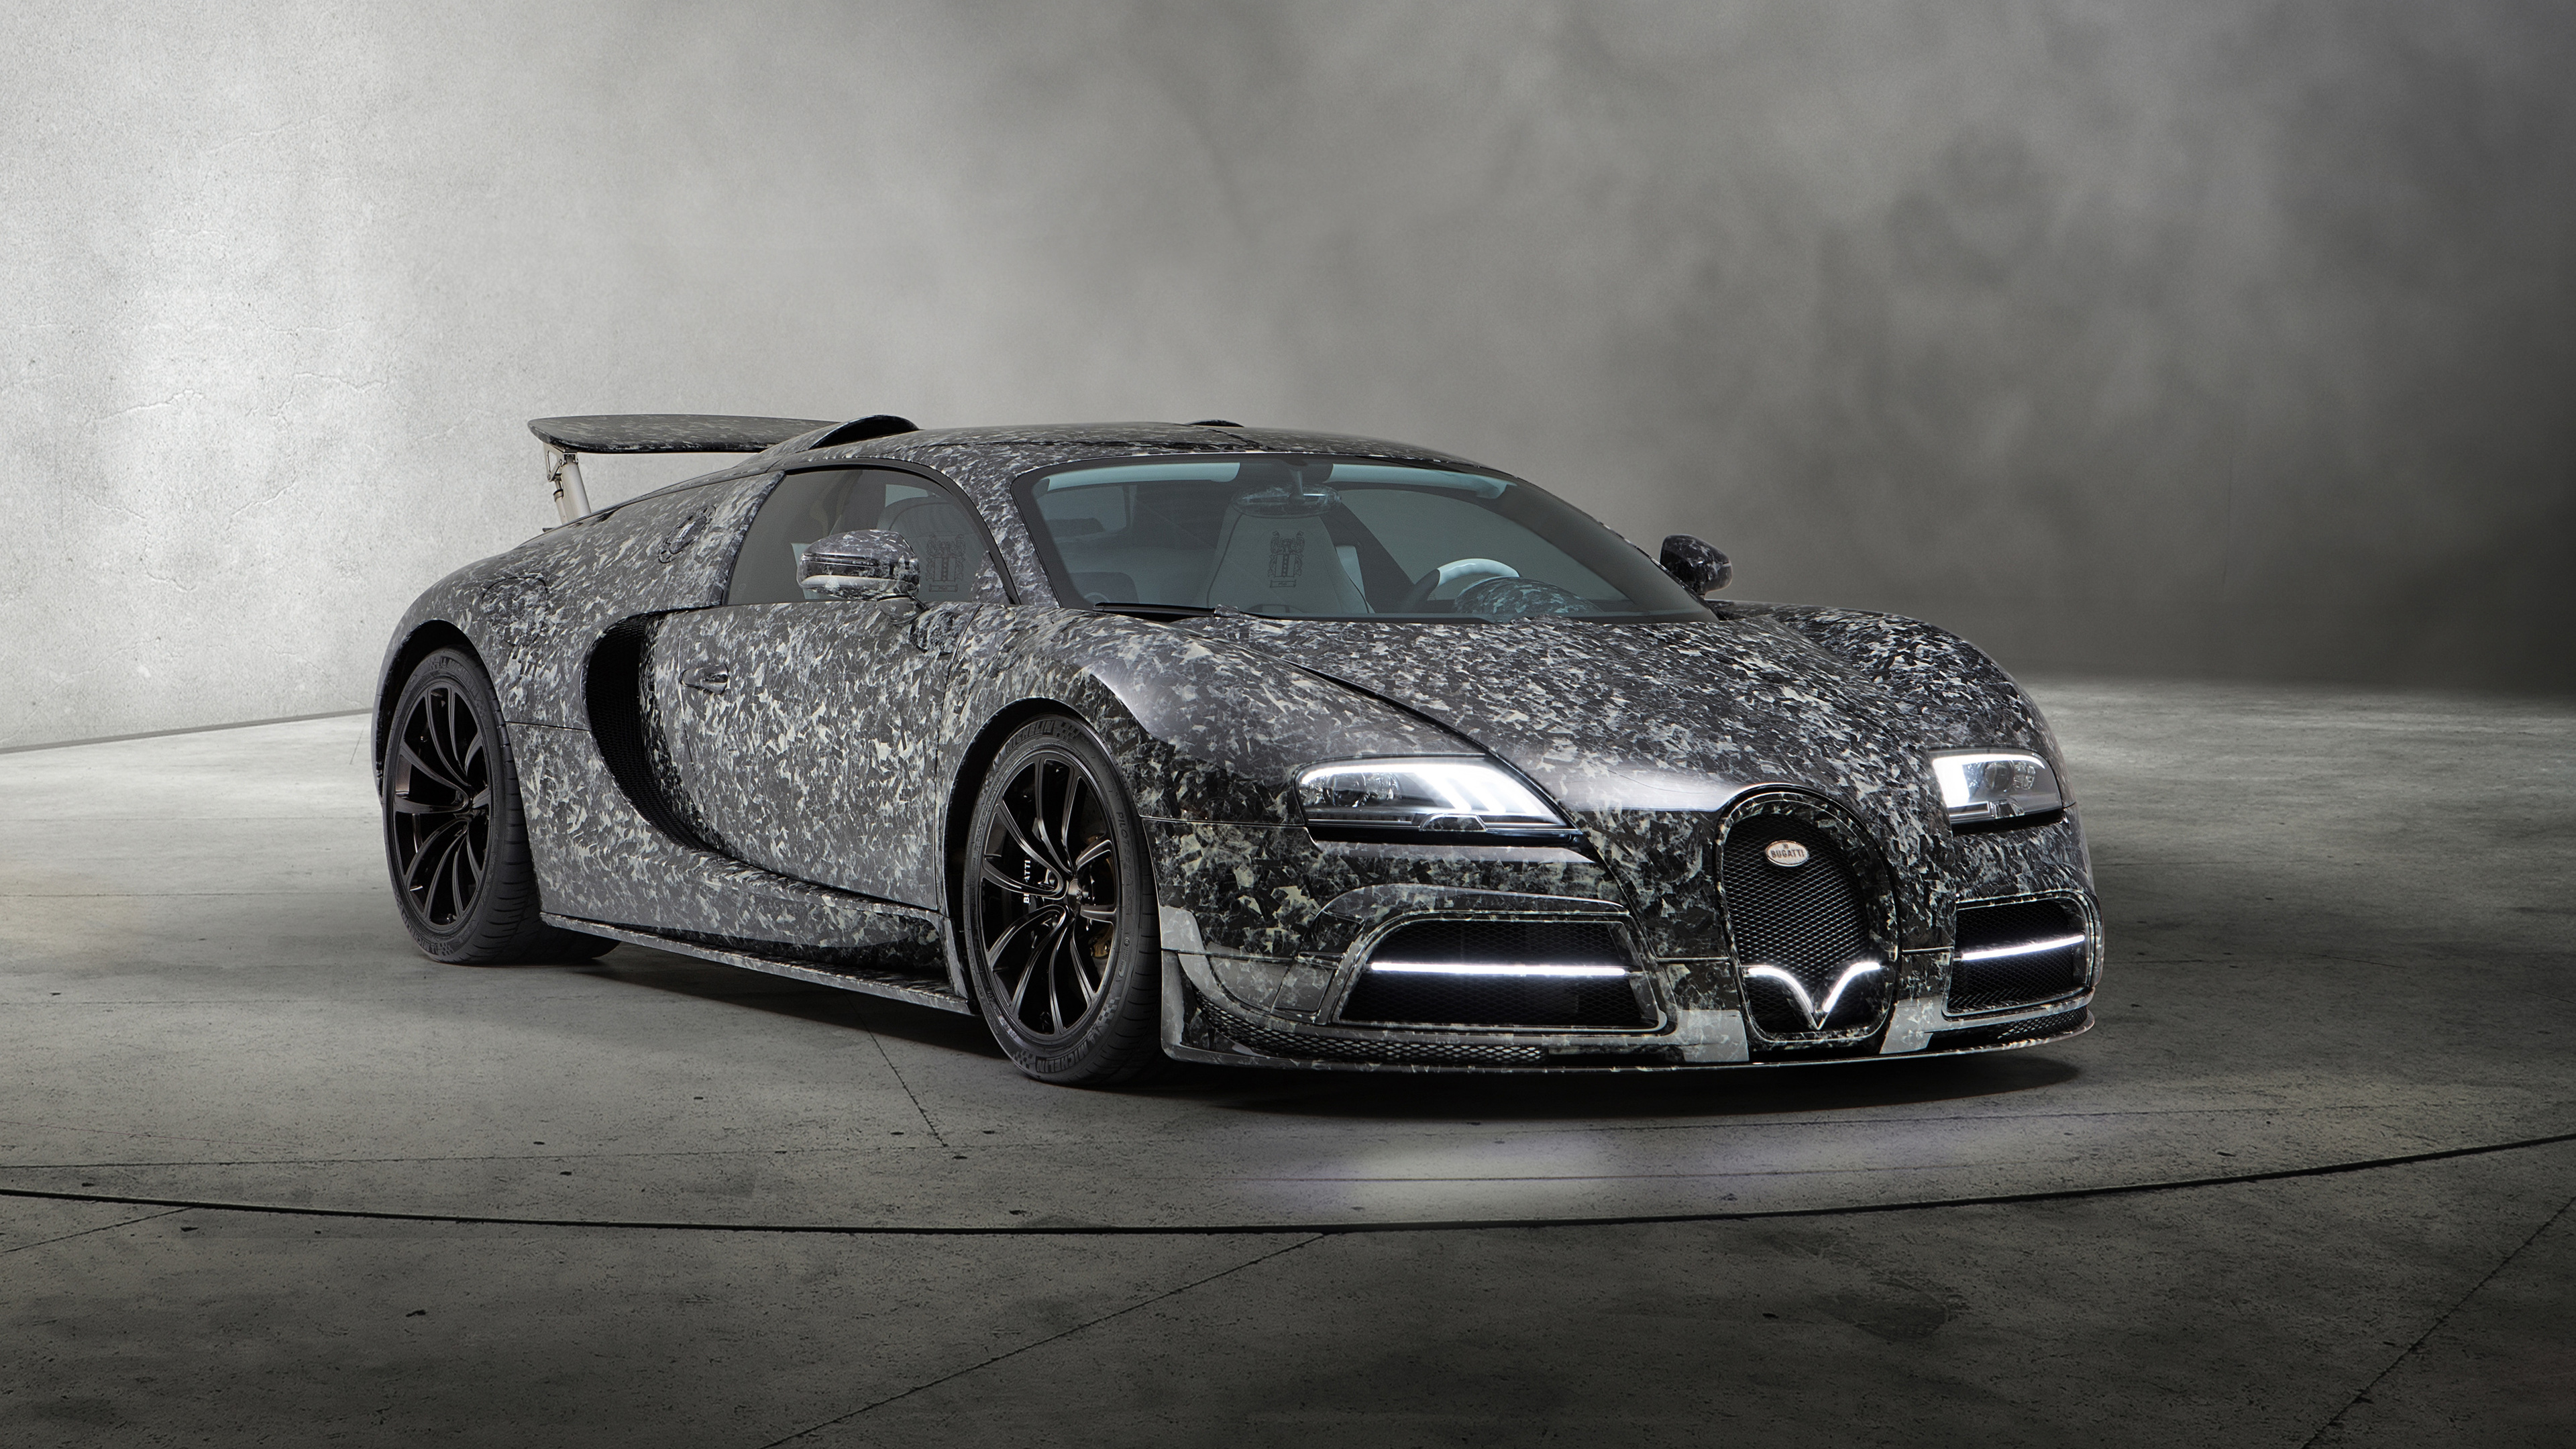 mansory bugatti veyron vivere diamond edition 2018 1539110102 - Mansory Bugatti Veyron Vivere Diamond Edition 2018 - mansory wallpapers, hd-wallpapers, cars wallpapers, bugatti veyron wallpapers, 4k-wallpapers, 2018 cars wallpapers